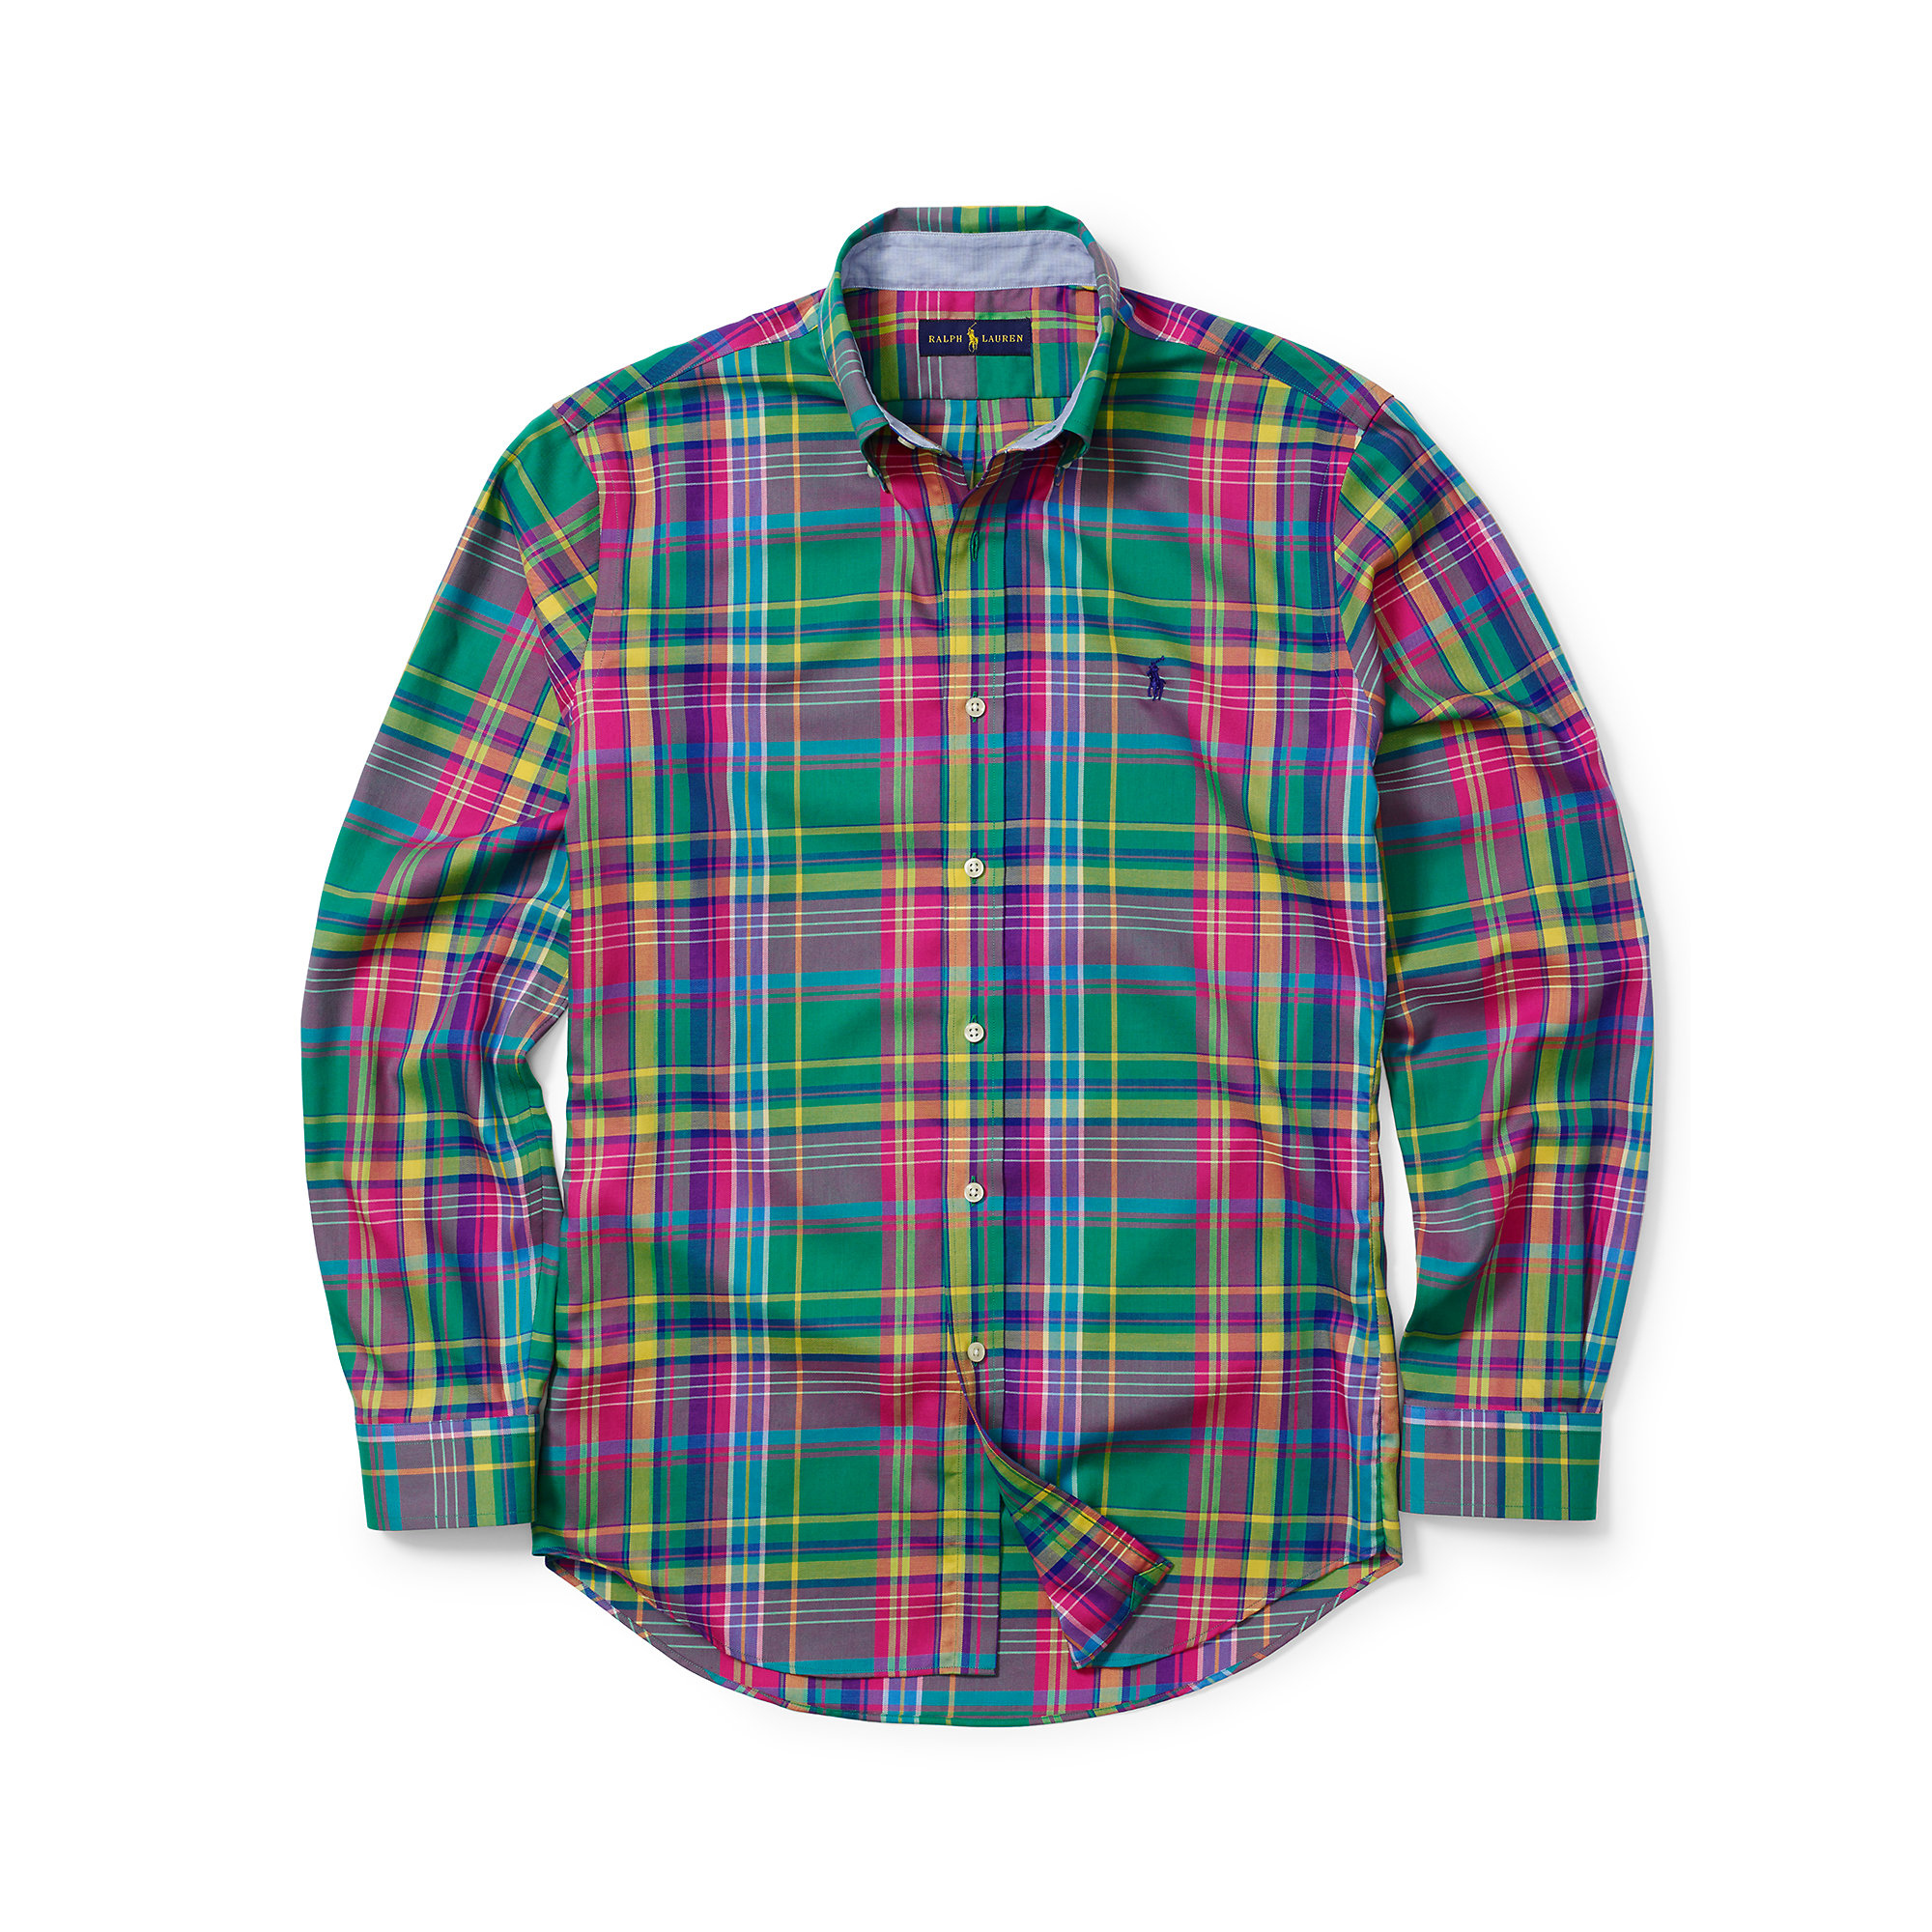 Ralph Lauren Plaid Cotton Poplin Shirt In Green For Men Lyst